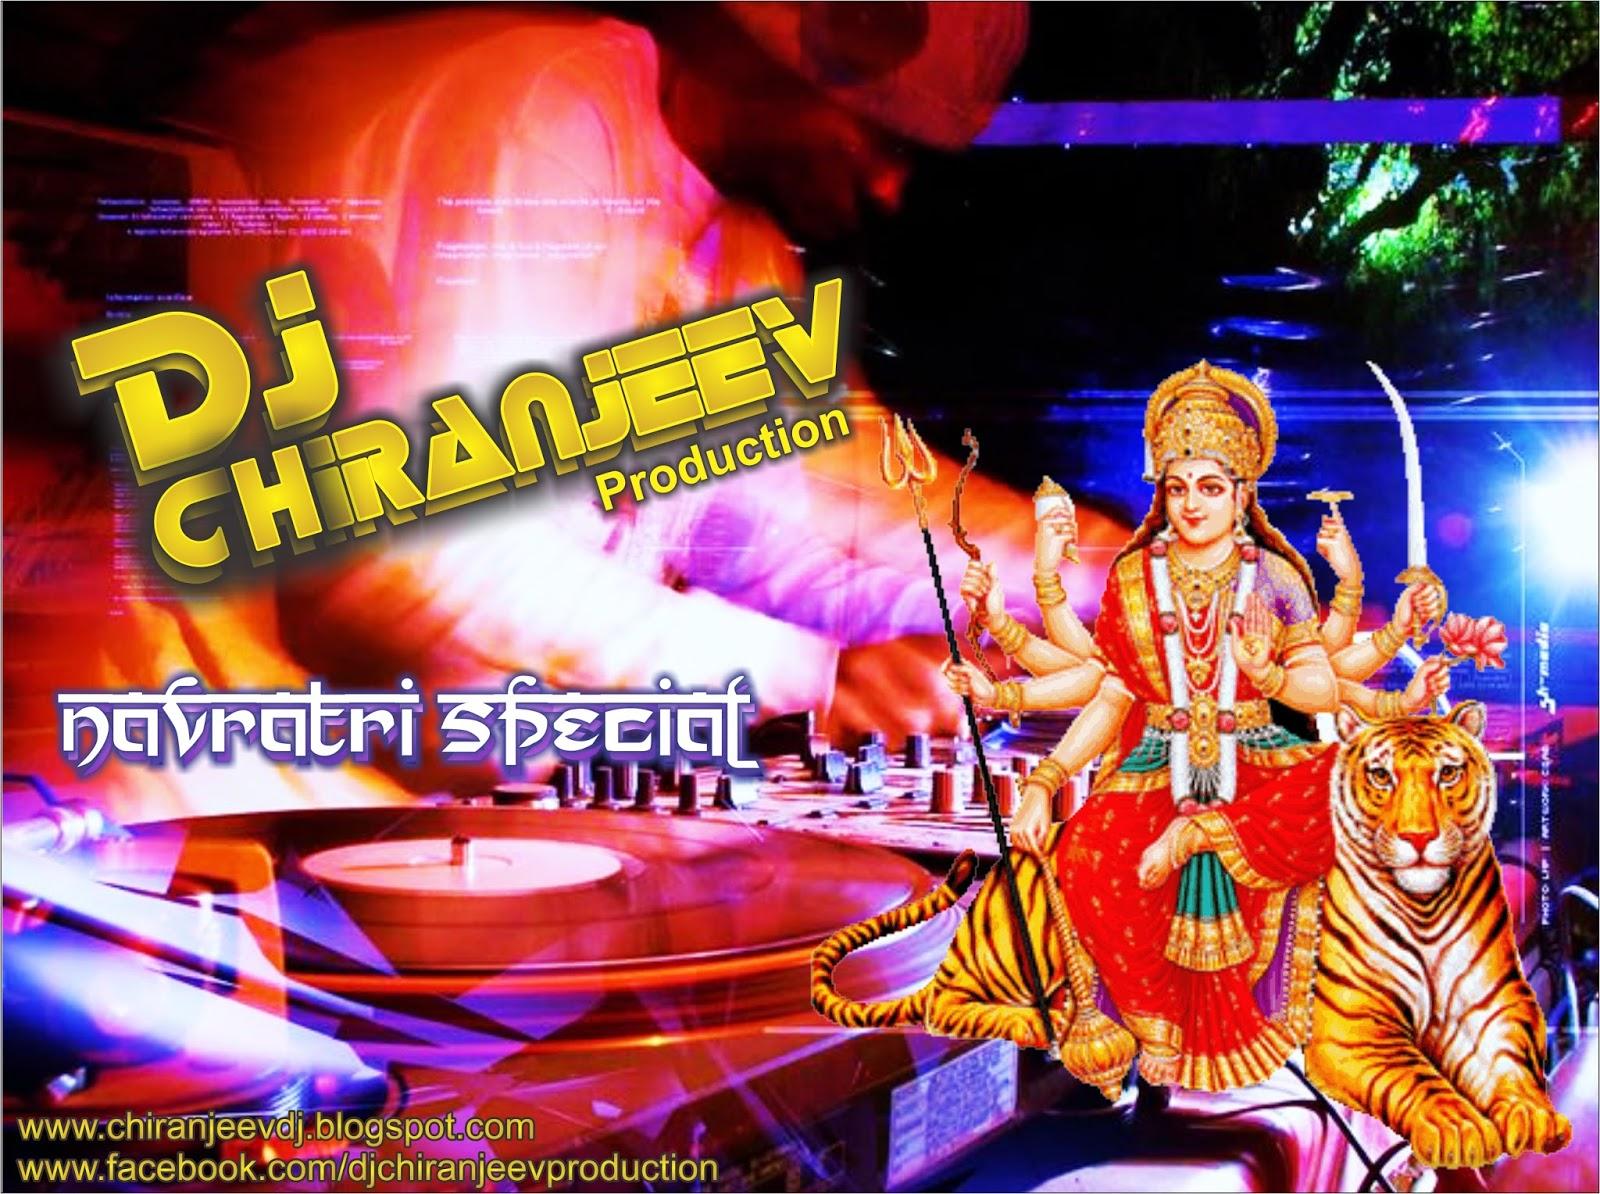 DJ ChIRNJeEV PRODUCTION*